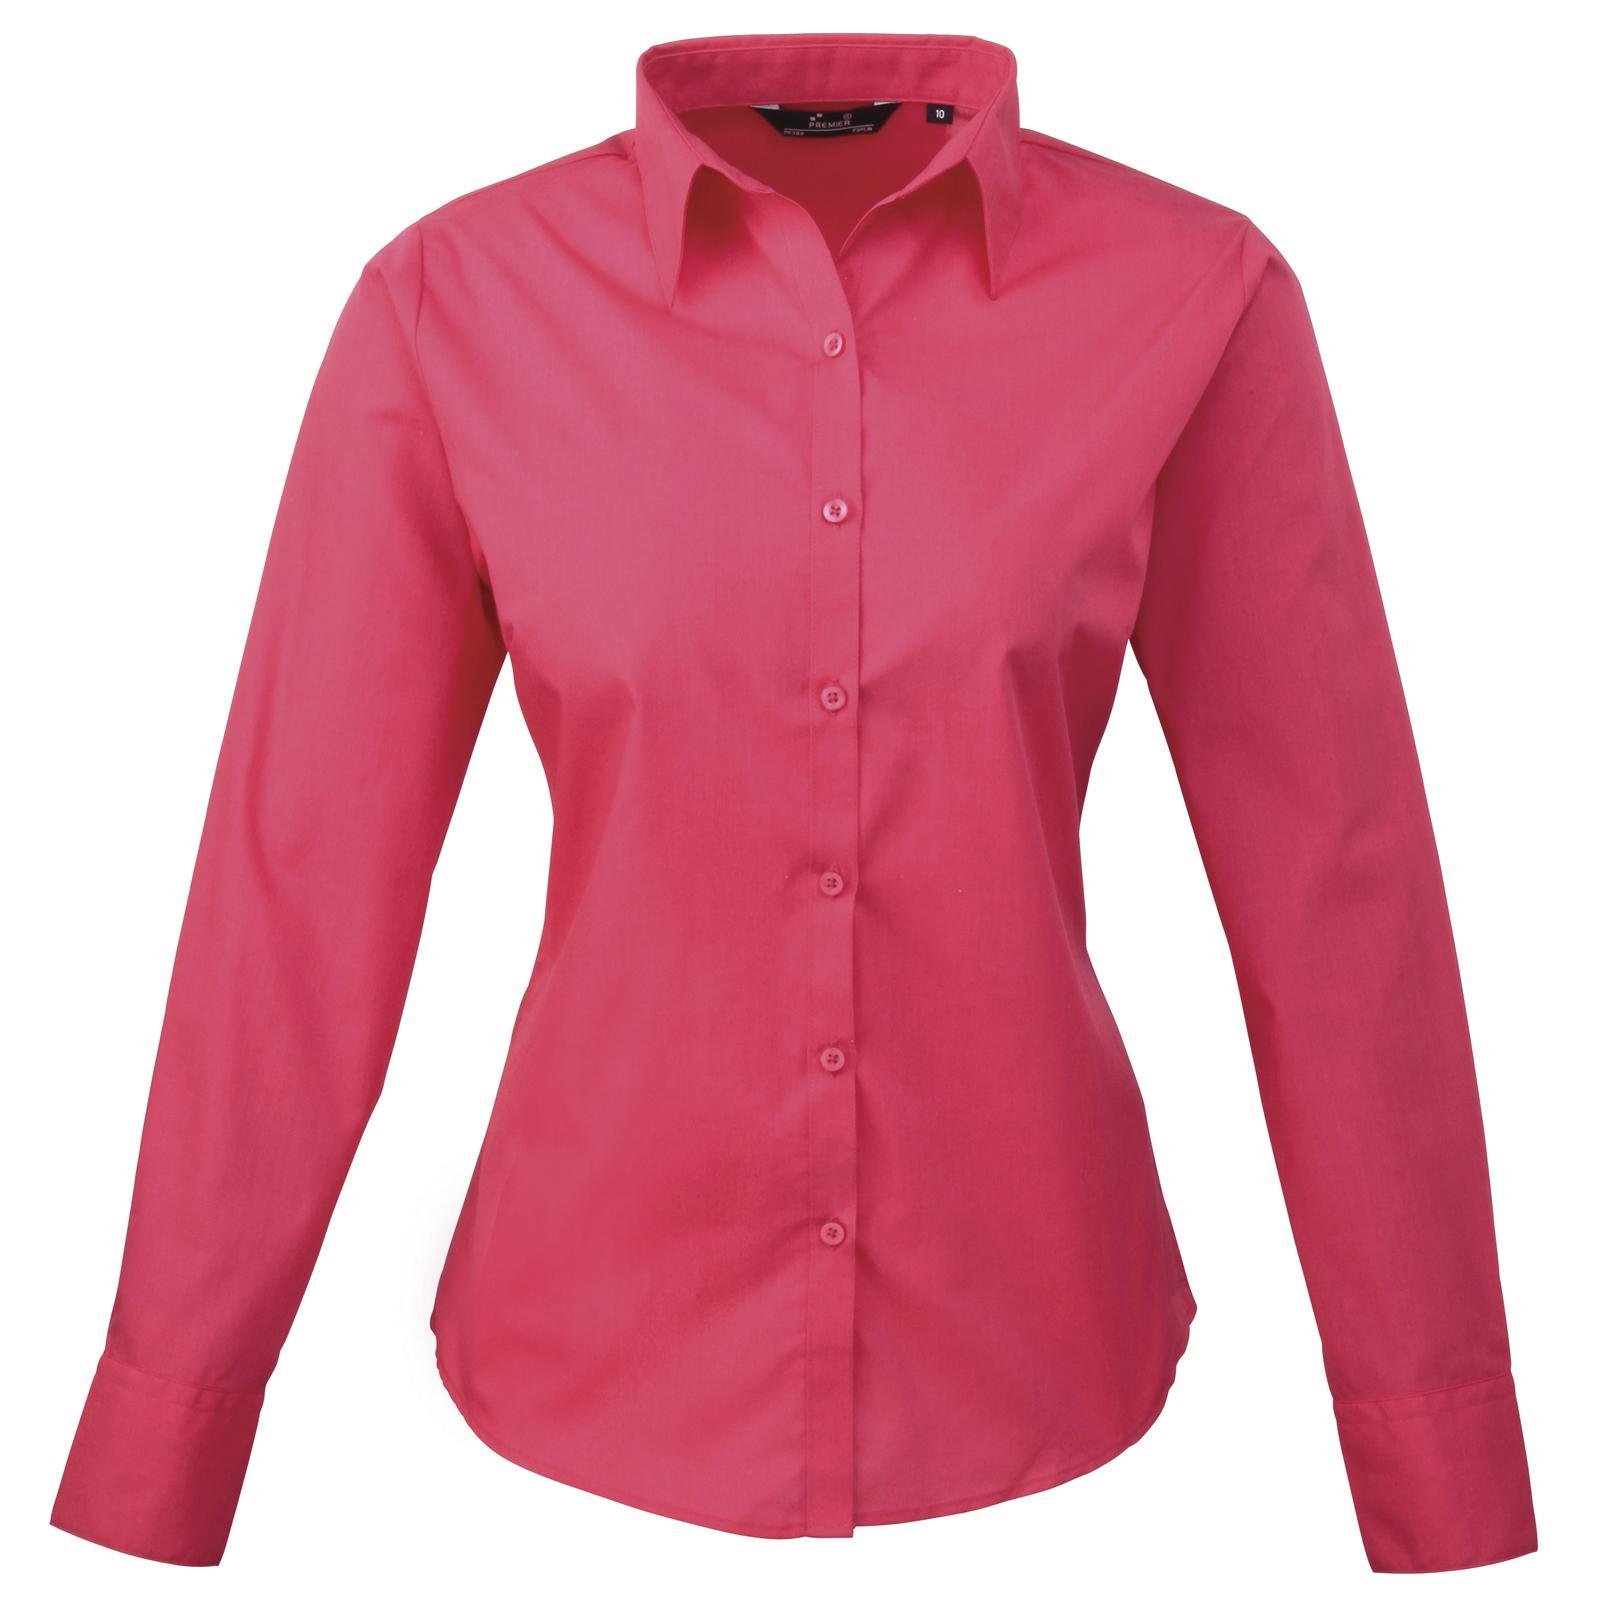 Premier Womens Ladies Poplin Long Sleeve Blouse Shirt 24